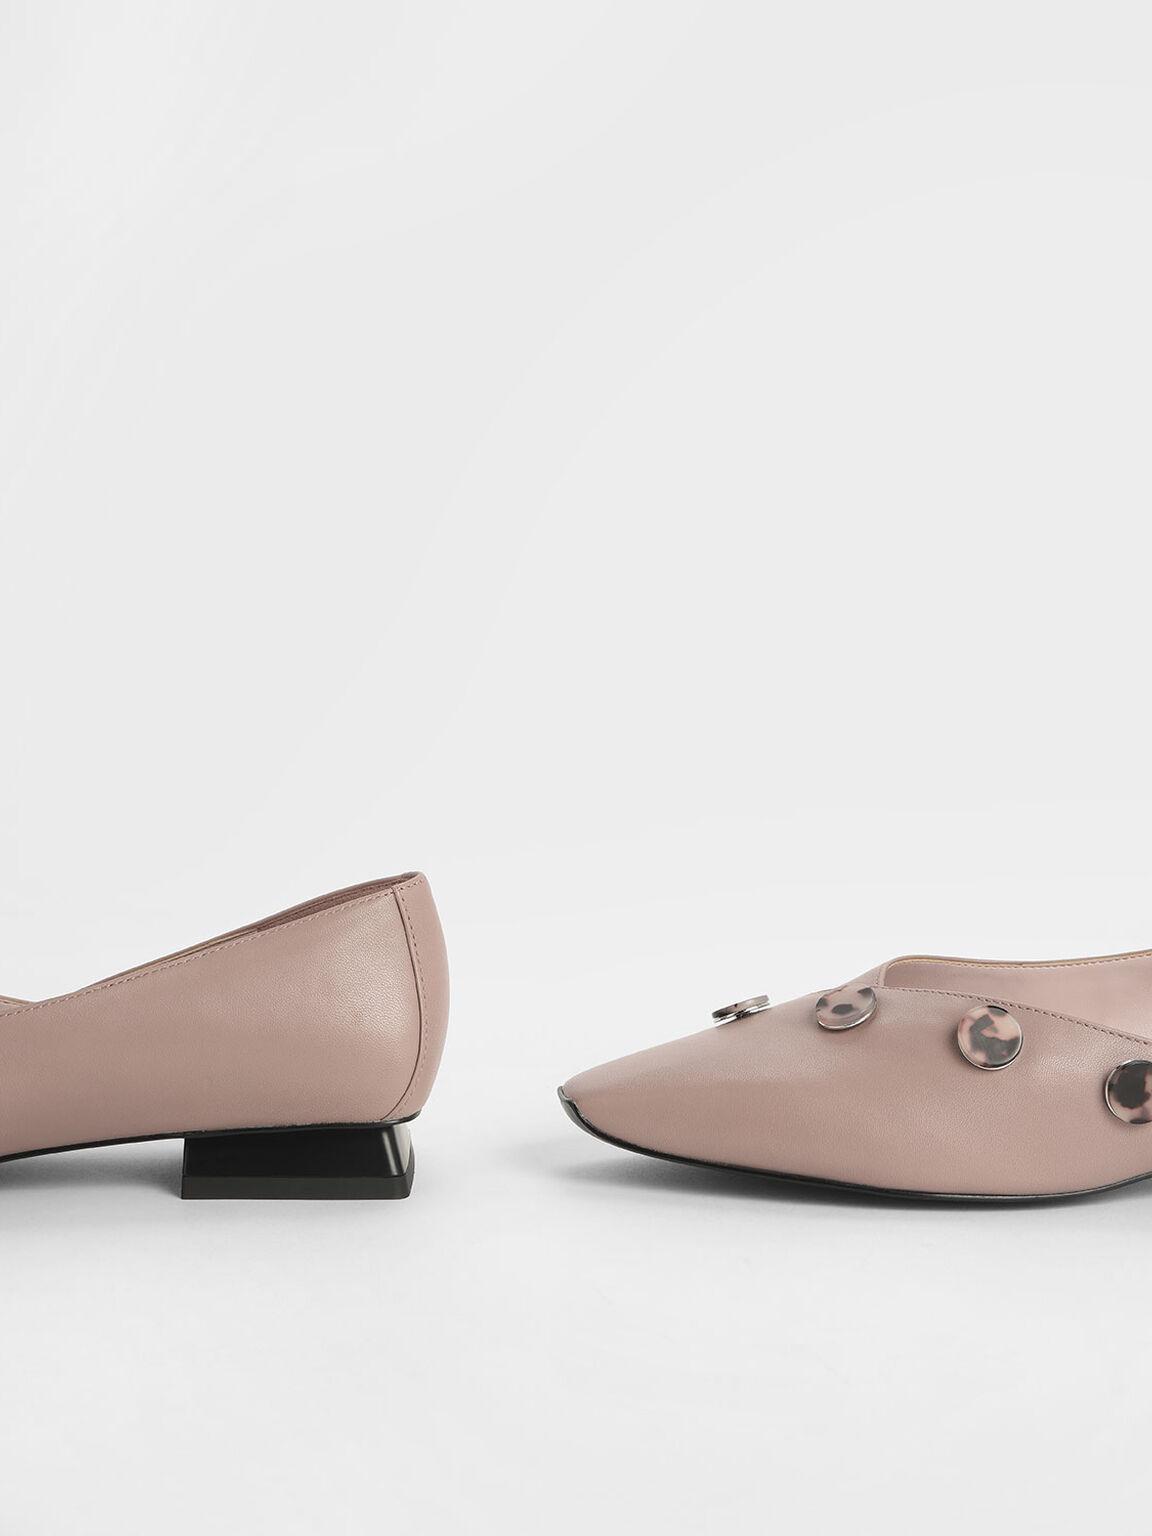 Tortoiseshell Button Detail Leather Flats, Mauve, hi-res